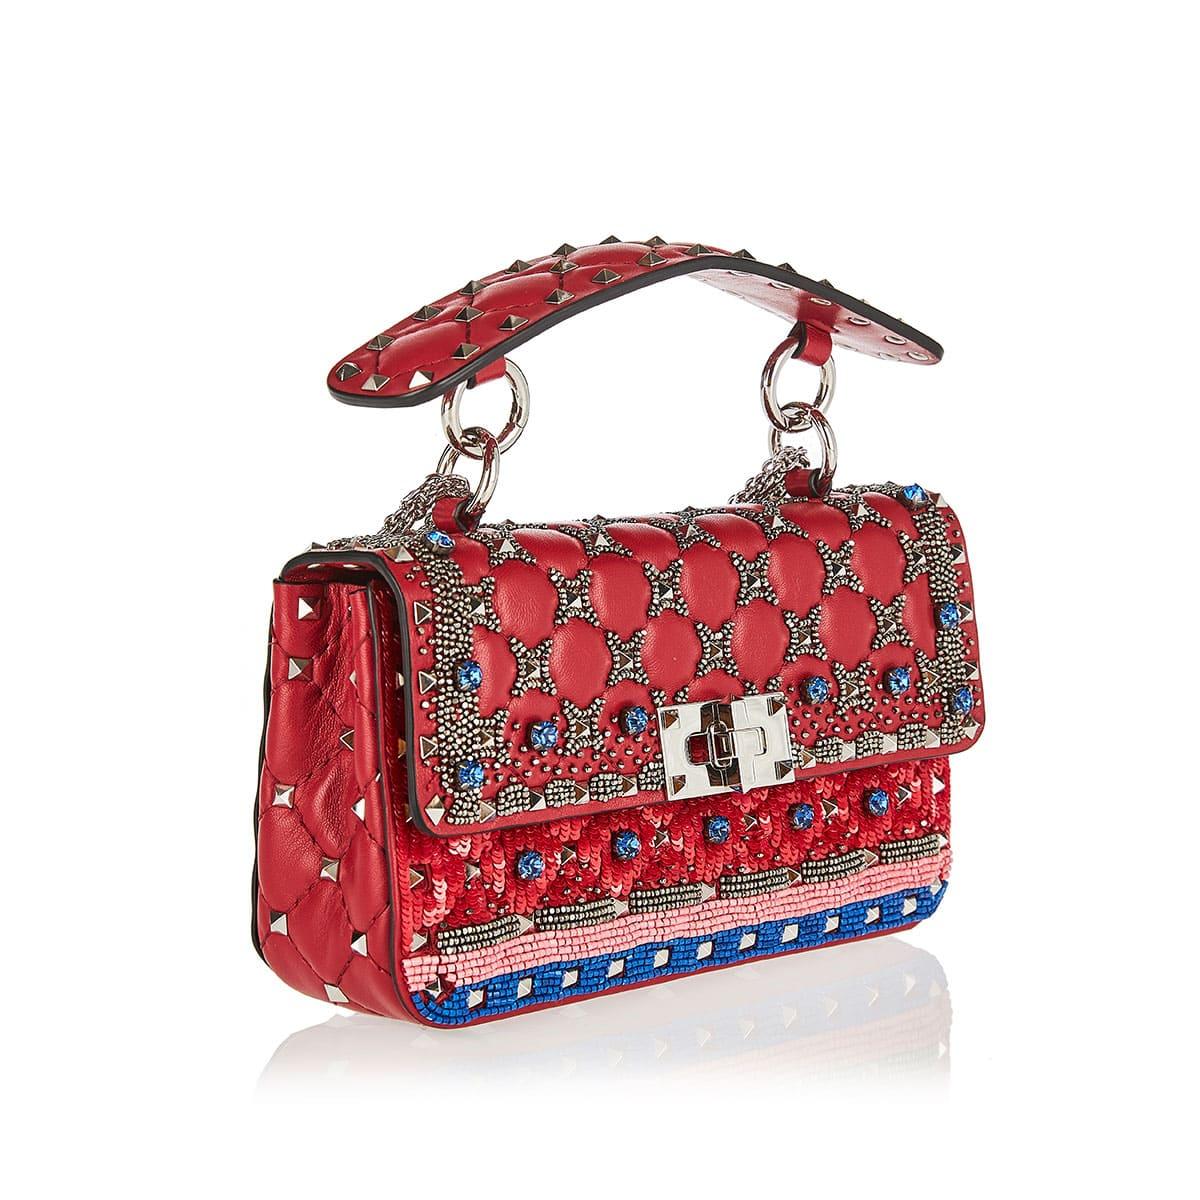 Rockstud Spike.It small embellished leather bag